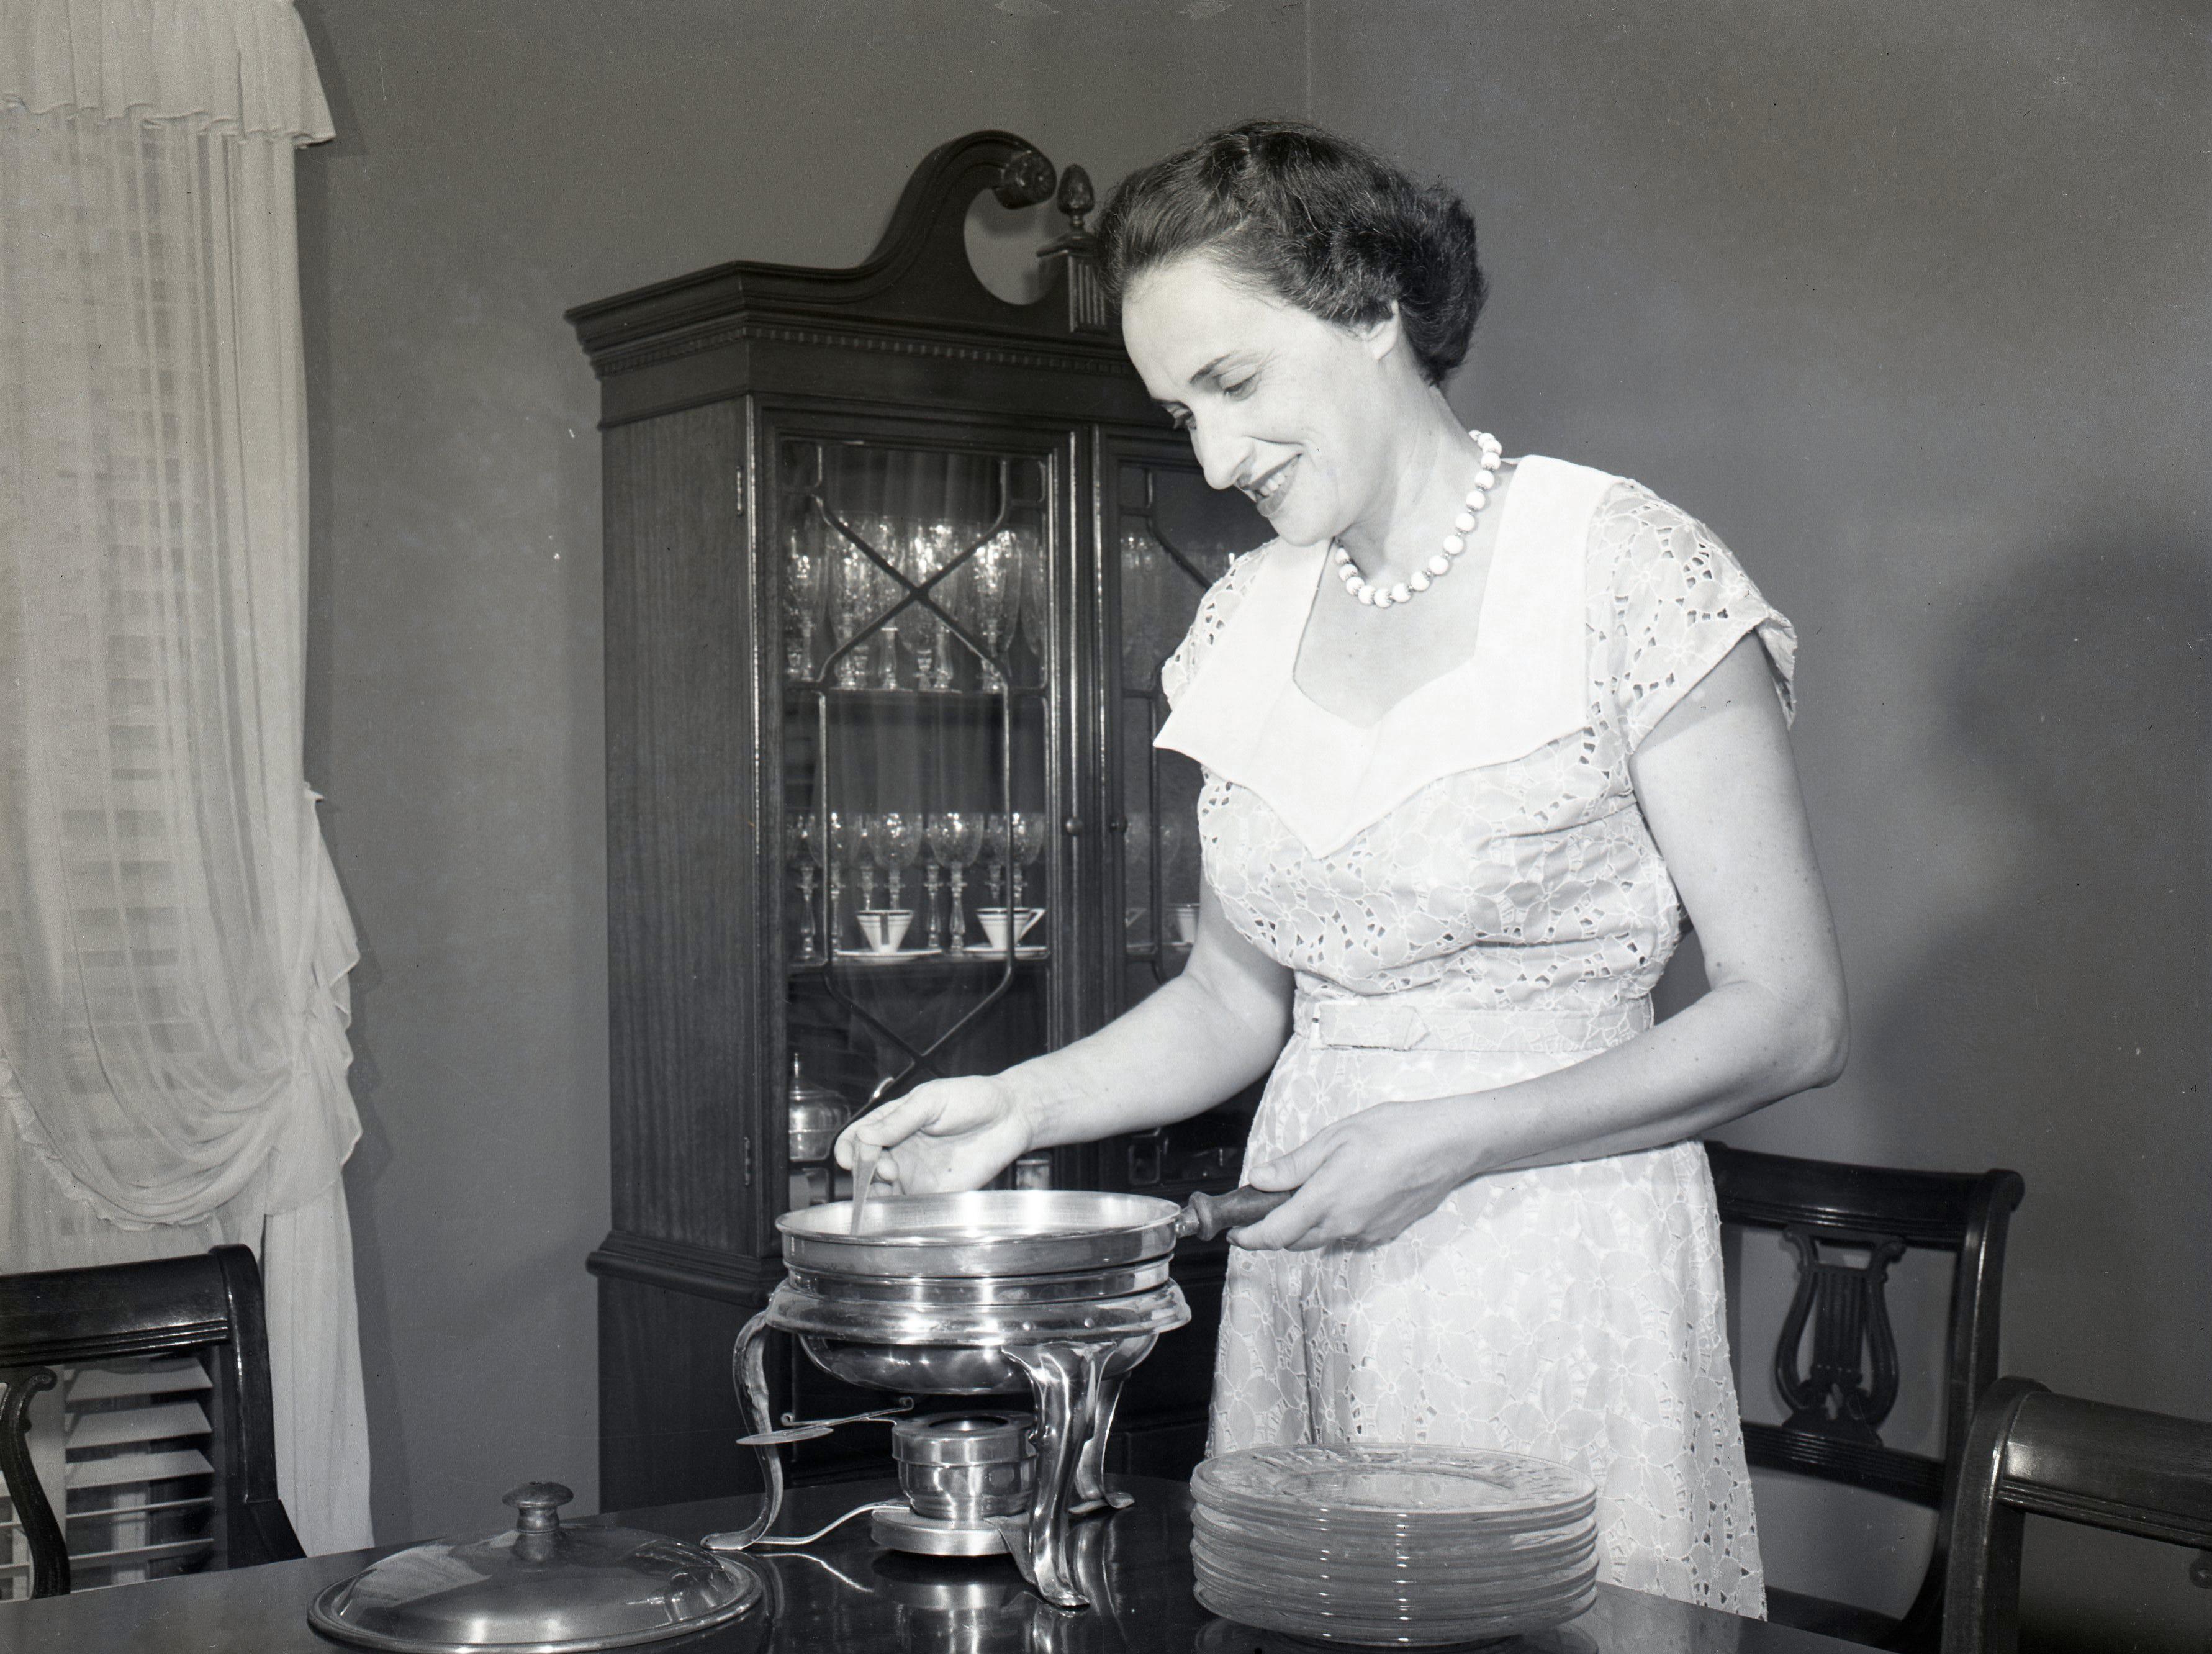 #TBT: Corpus Christi's Temple Beth El Sisterhood sold cookbook as fundraiser in 1951